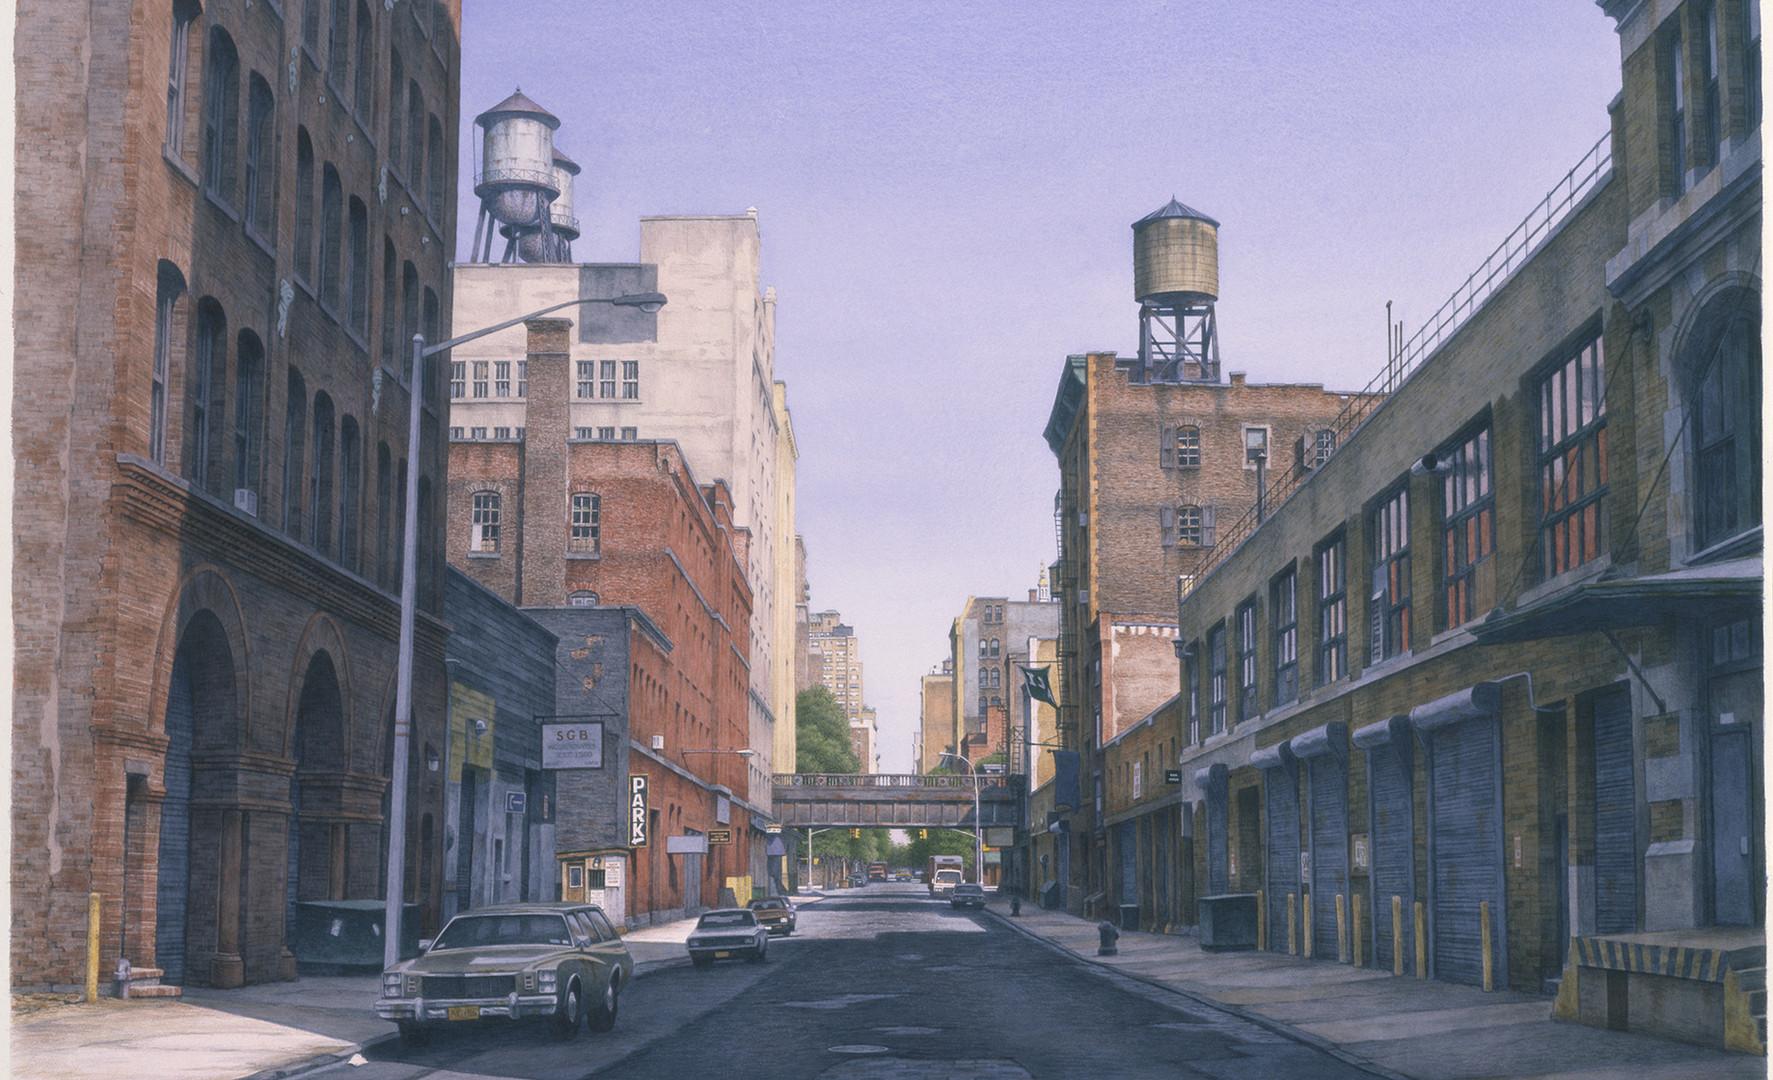 25th Street, 1996